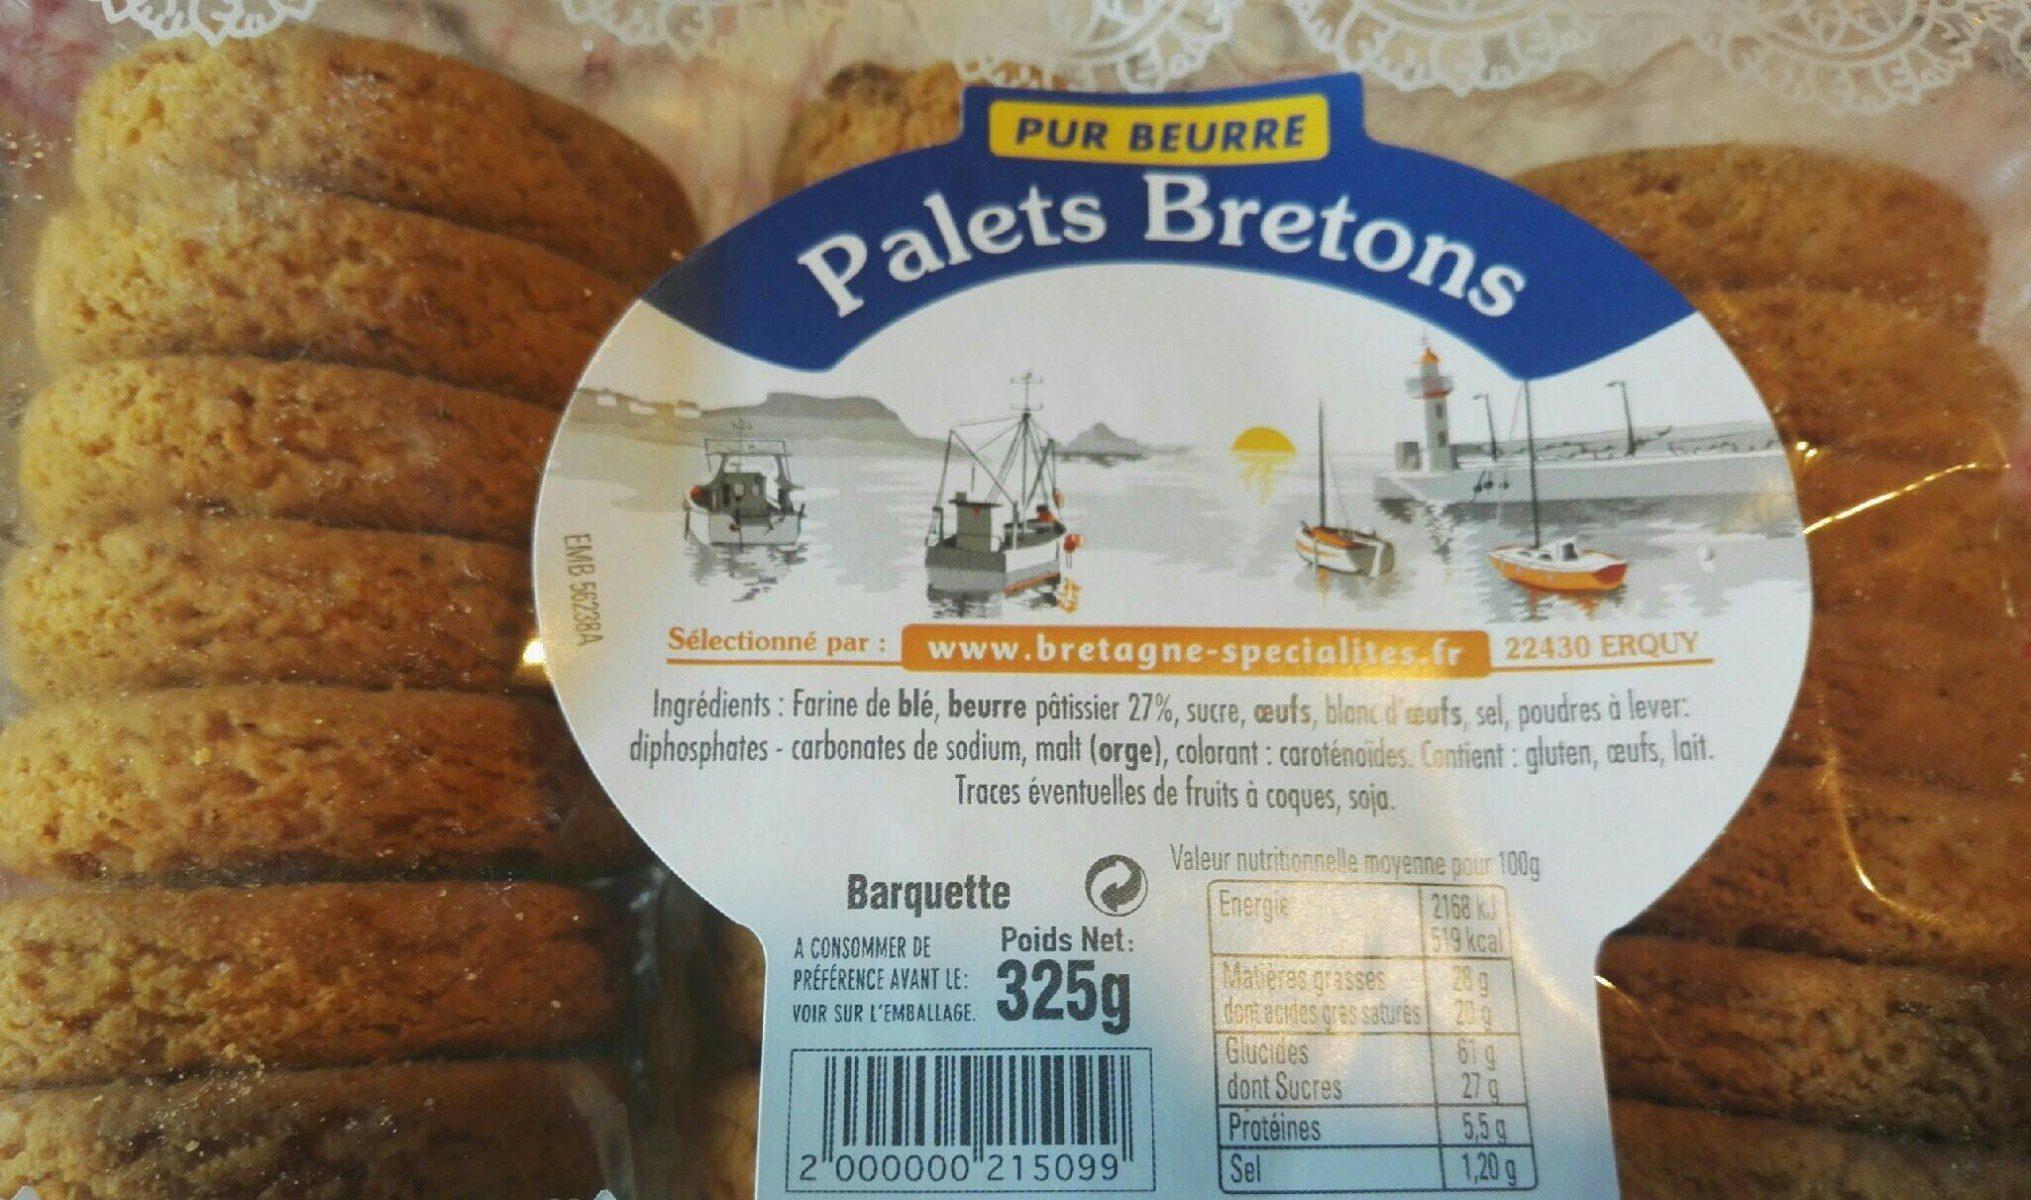 Palets Bretons - Product - fr